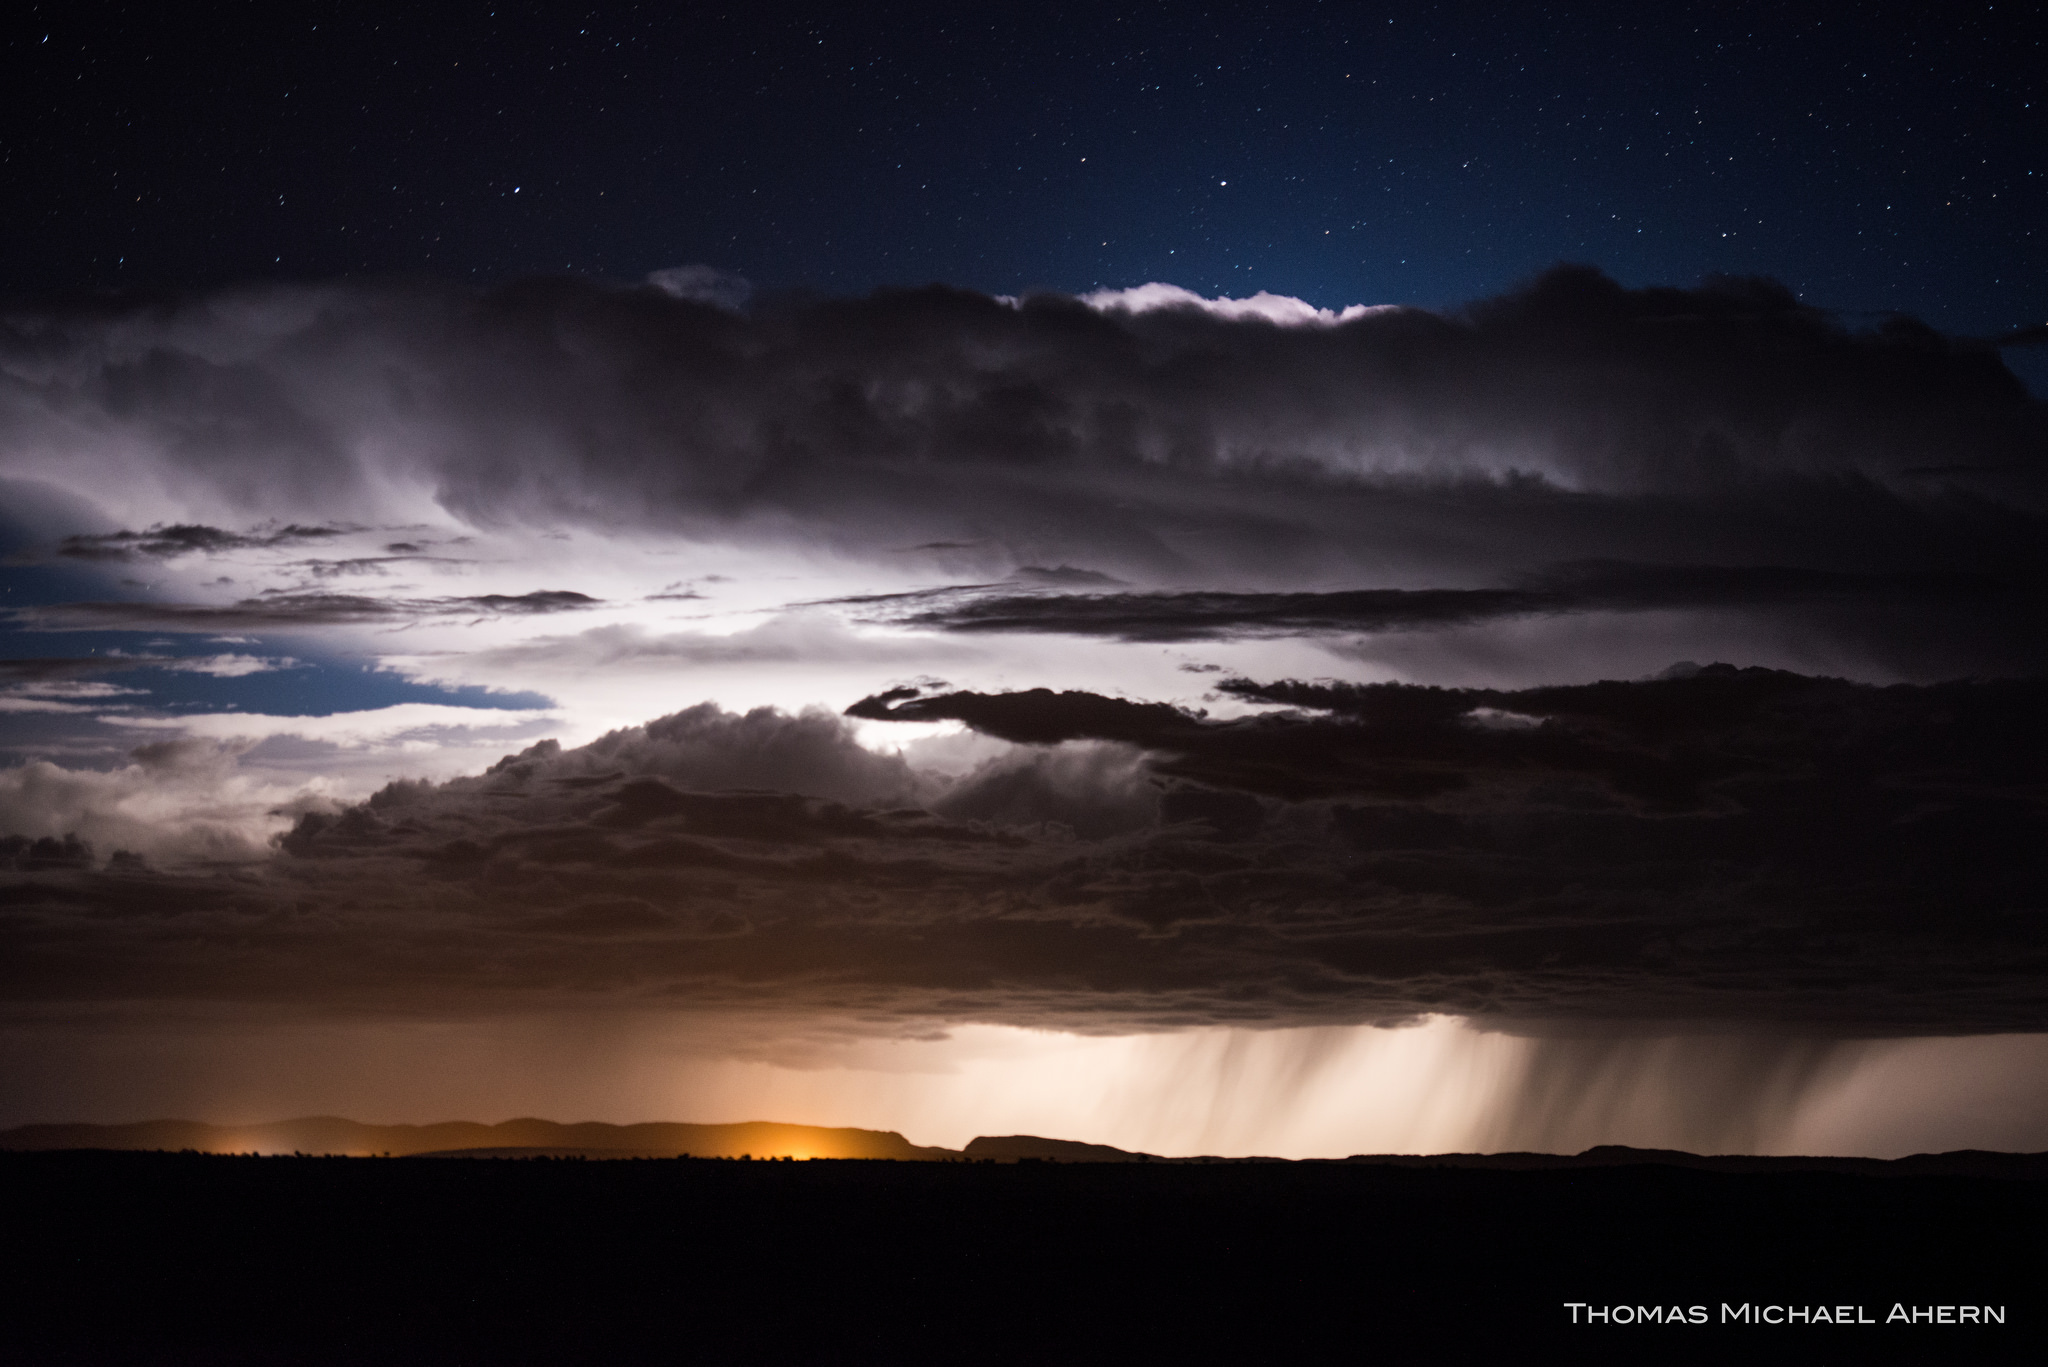 Stormy City, Australia